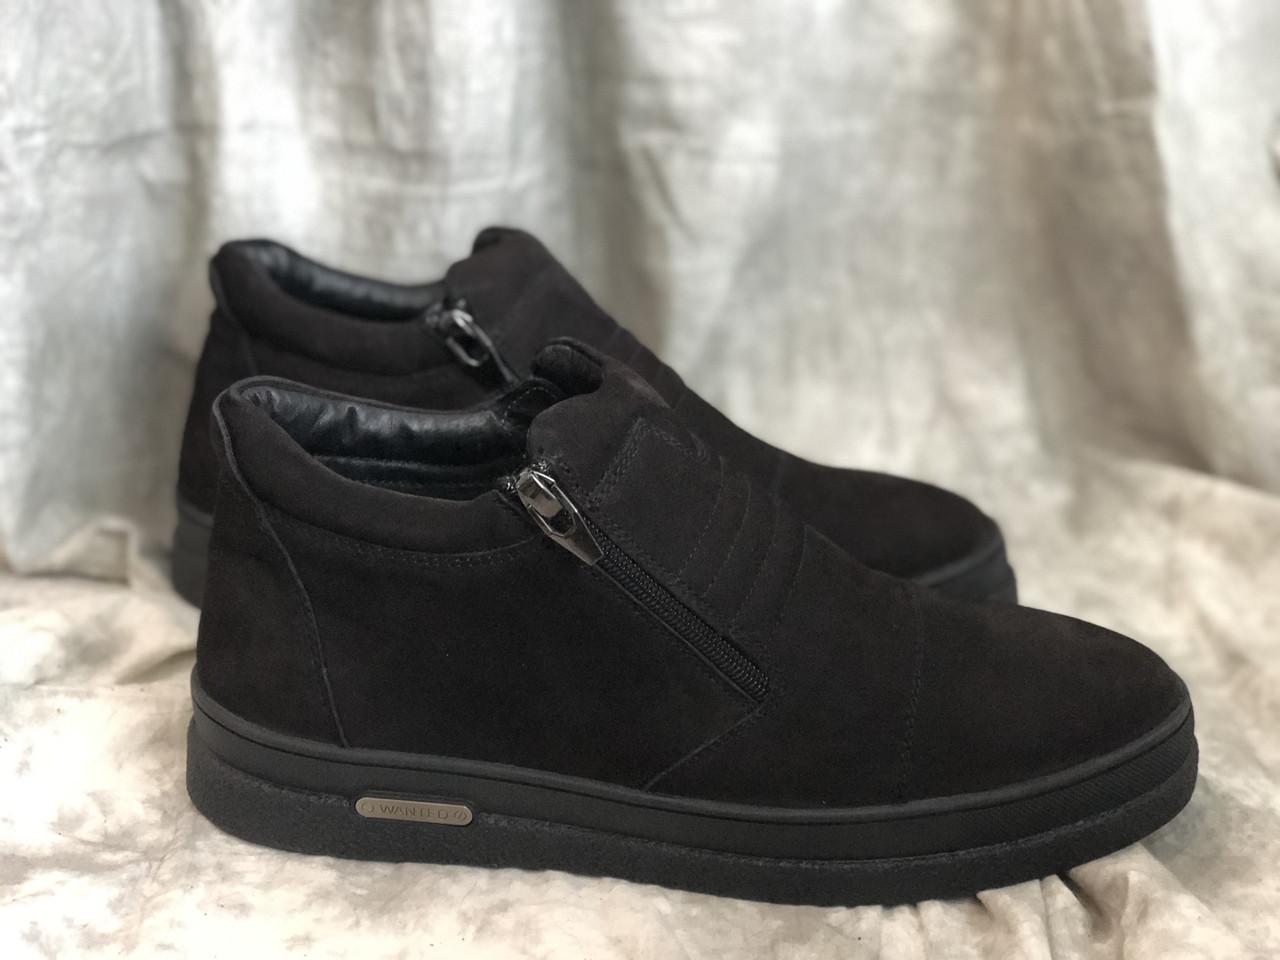 Кожаные ботинки мужские зима 14318 кор размеры 41,43,45